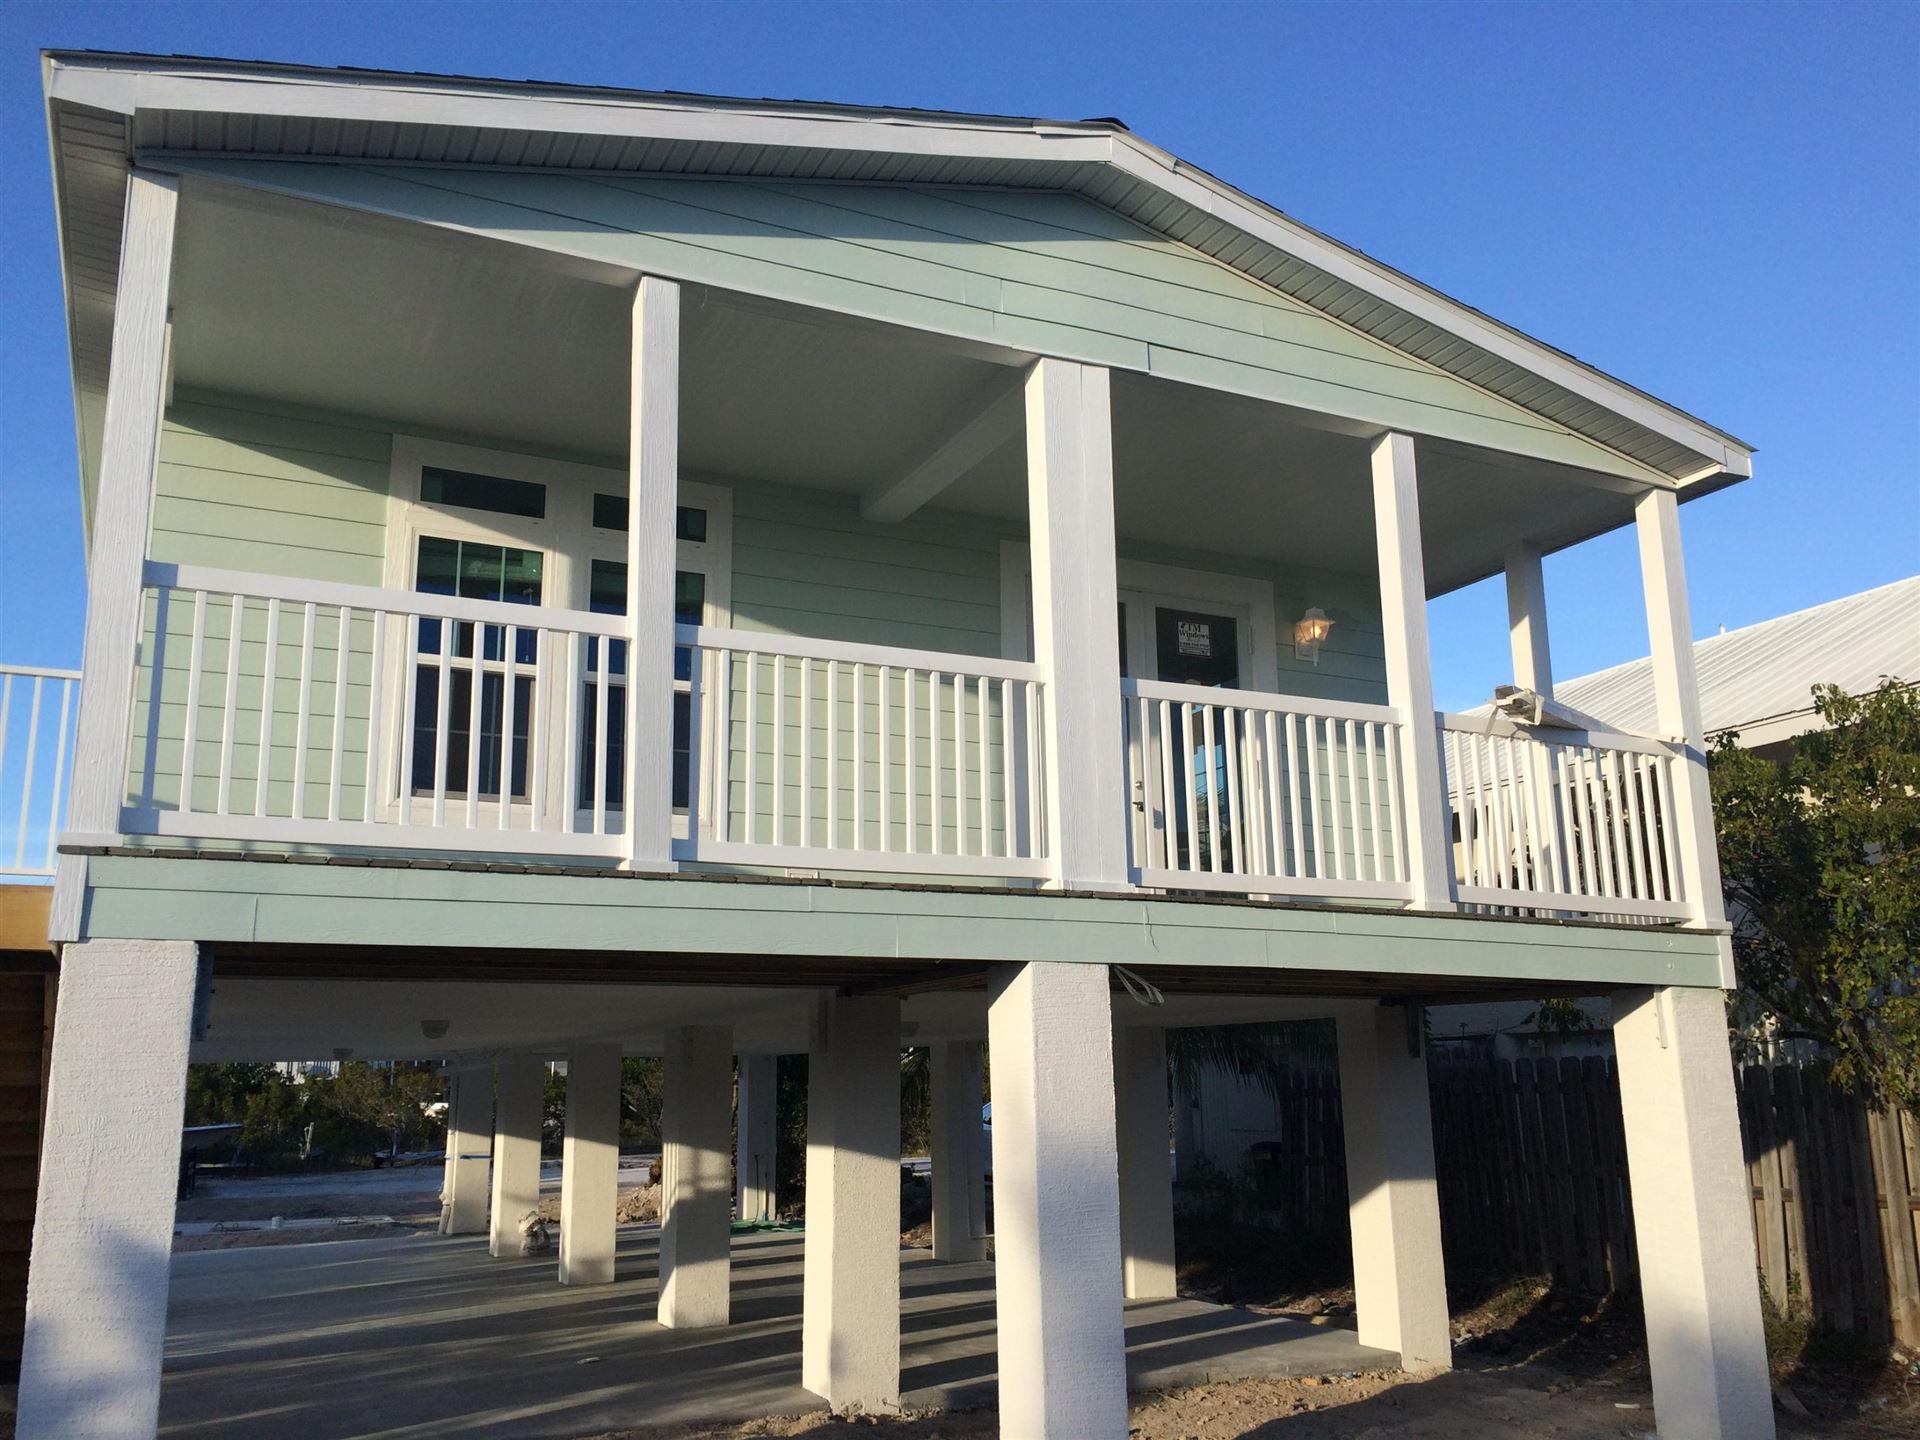 362 Brown Drive, Summerland Key, FL 33042 - #: 591186